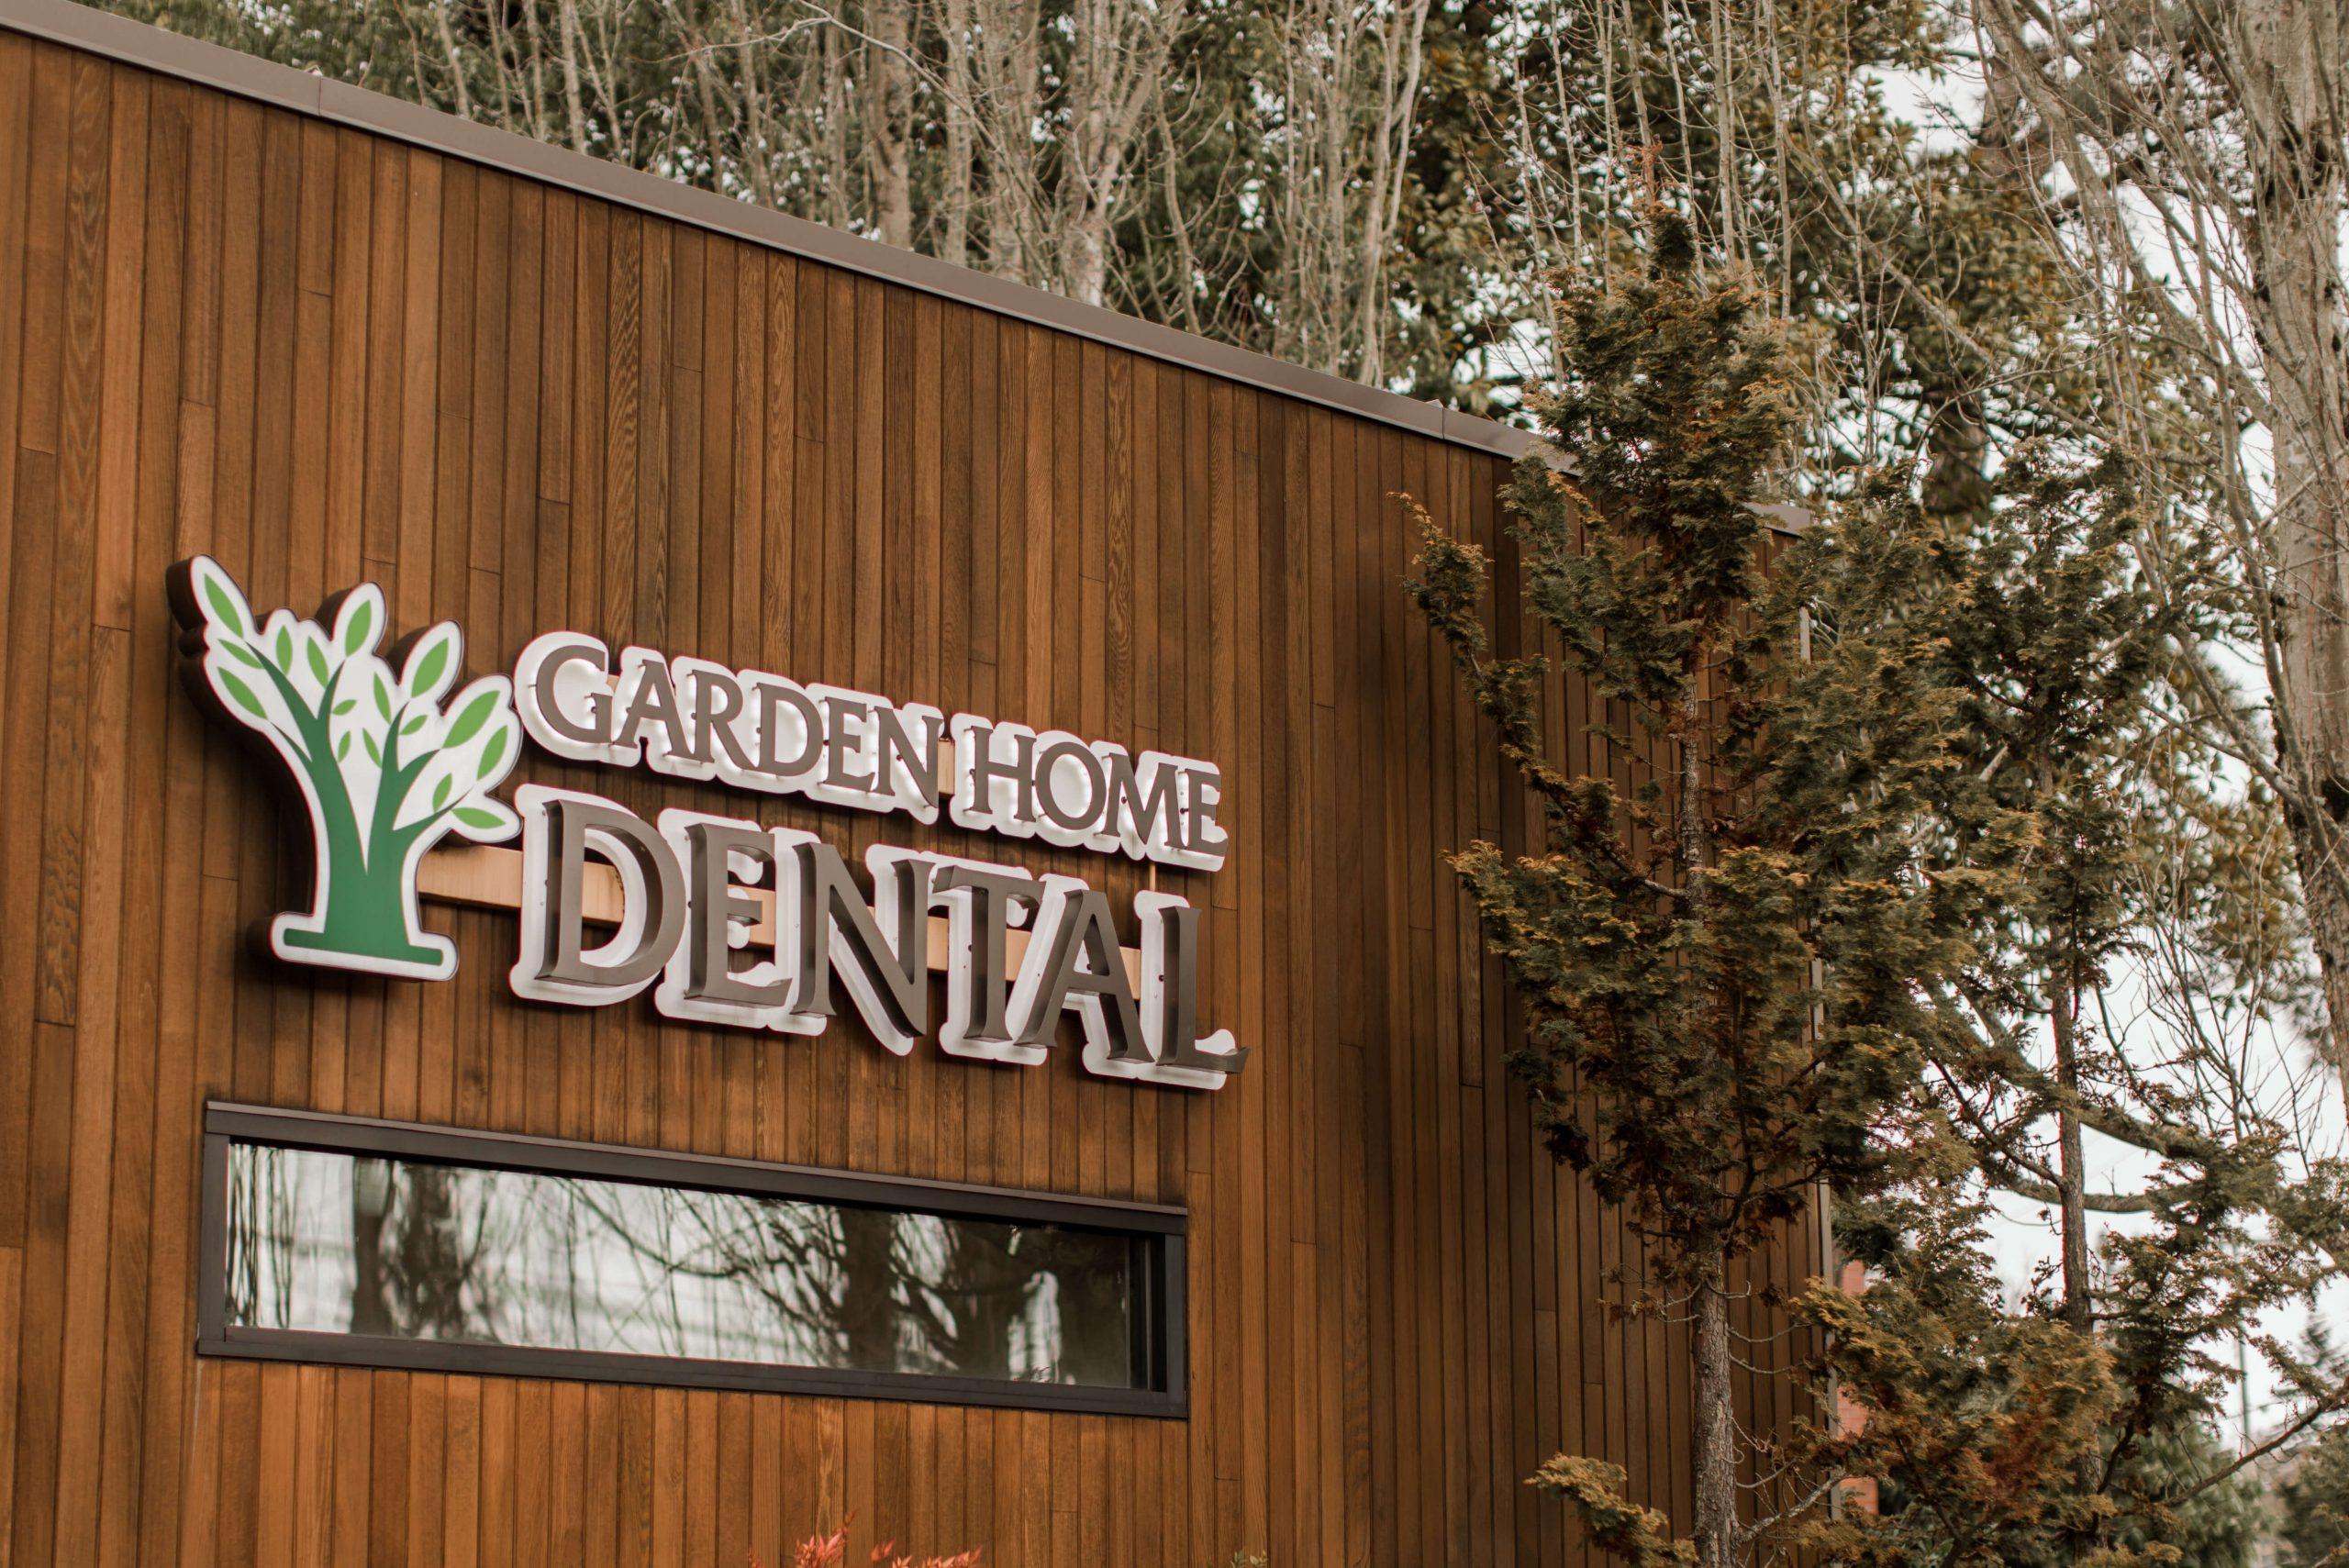 garden home dental - portland dental office exterior